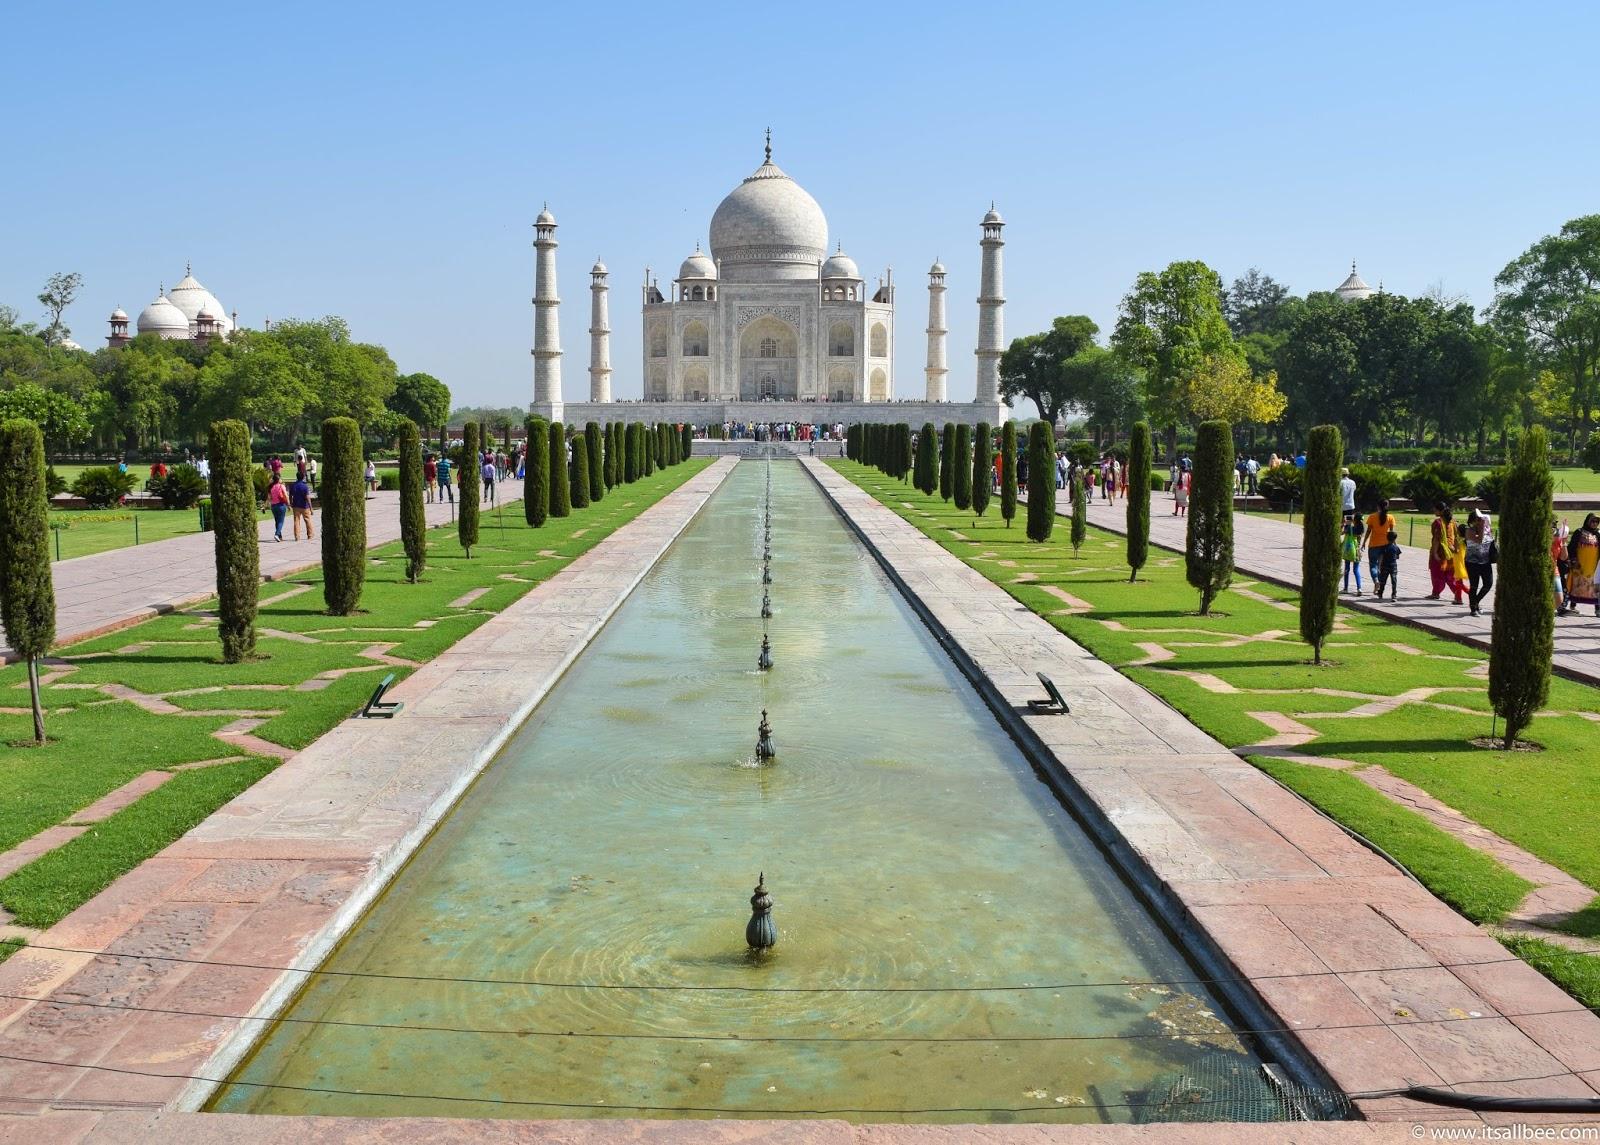 Tips For visiting Taj Mahal | - 13 Tips For Visiting The Taj Mahal In Agra India